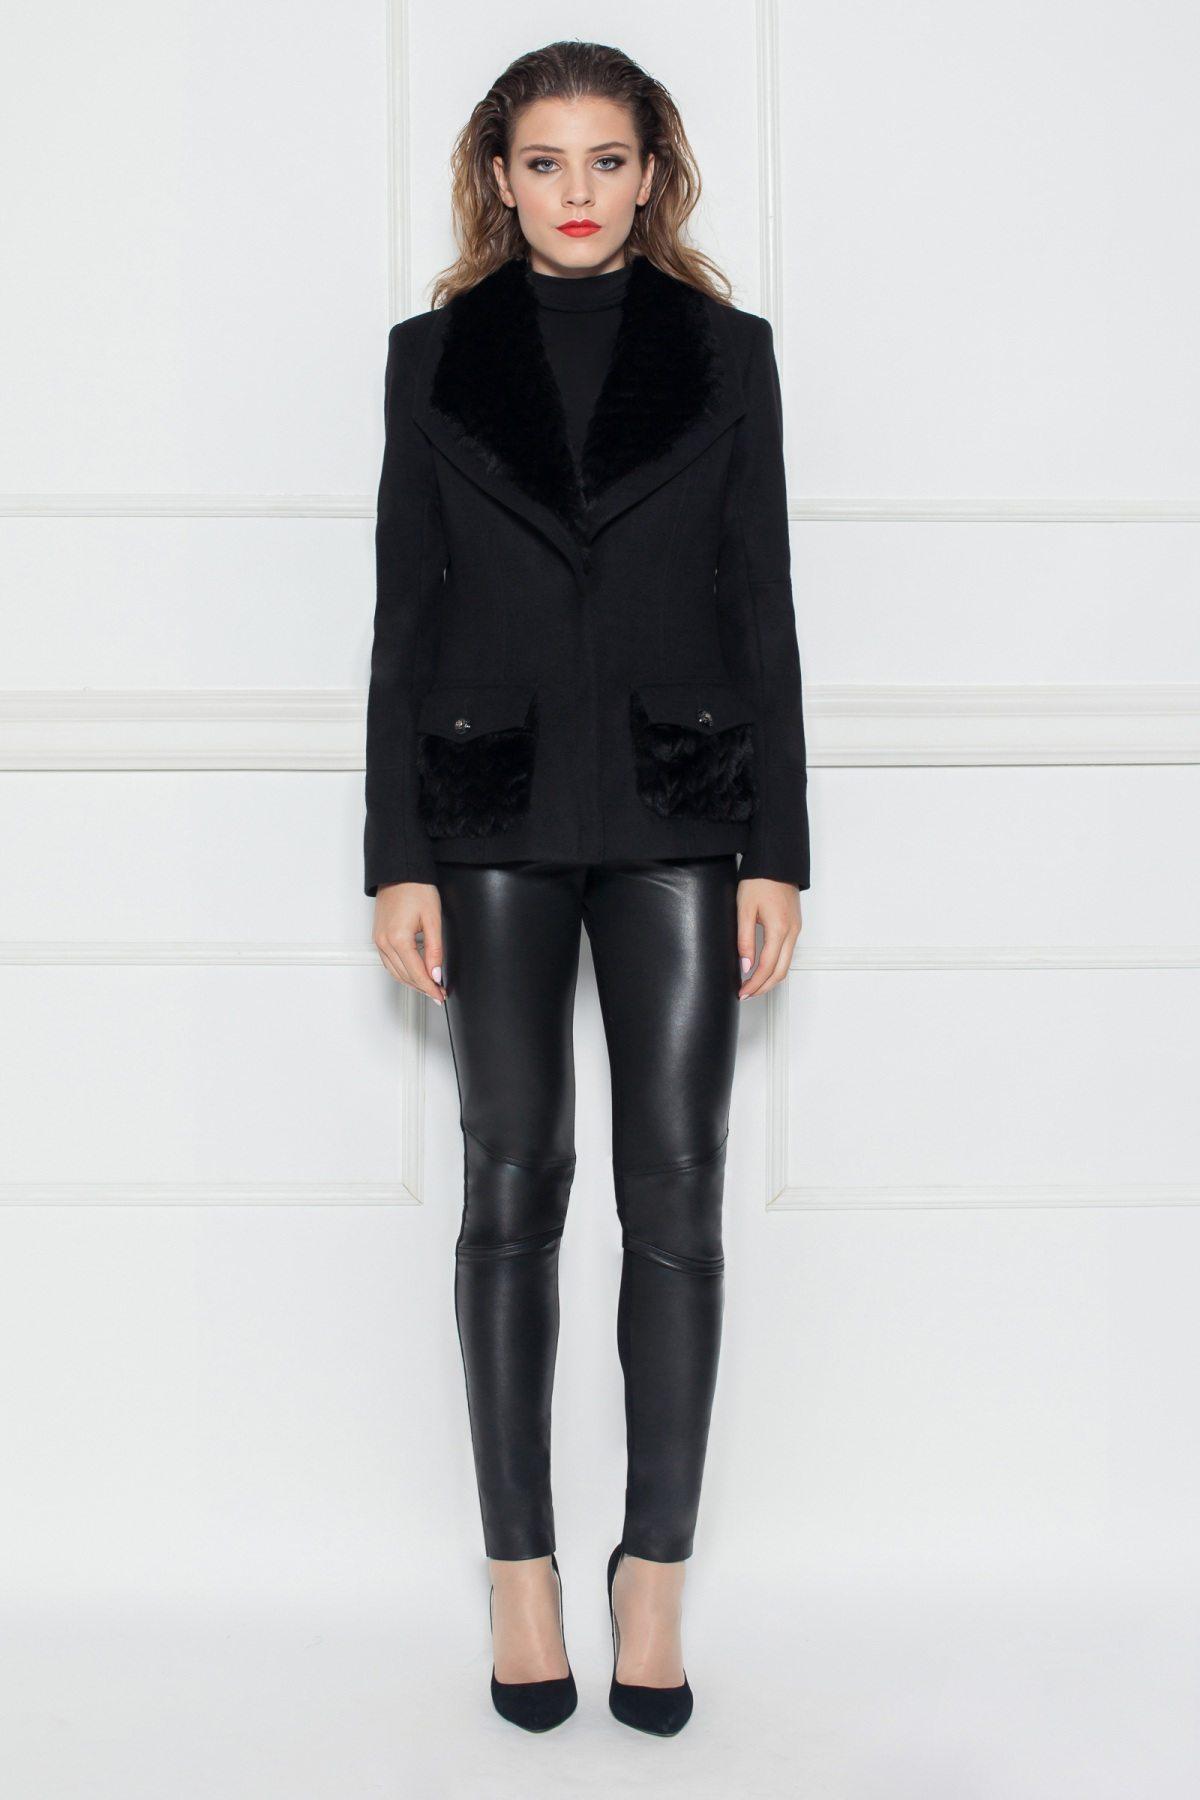 Jacheta neagra cu detalii din blana artificiala Negru